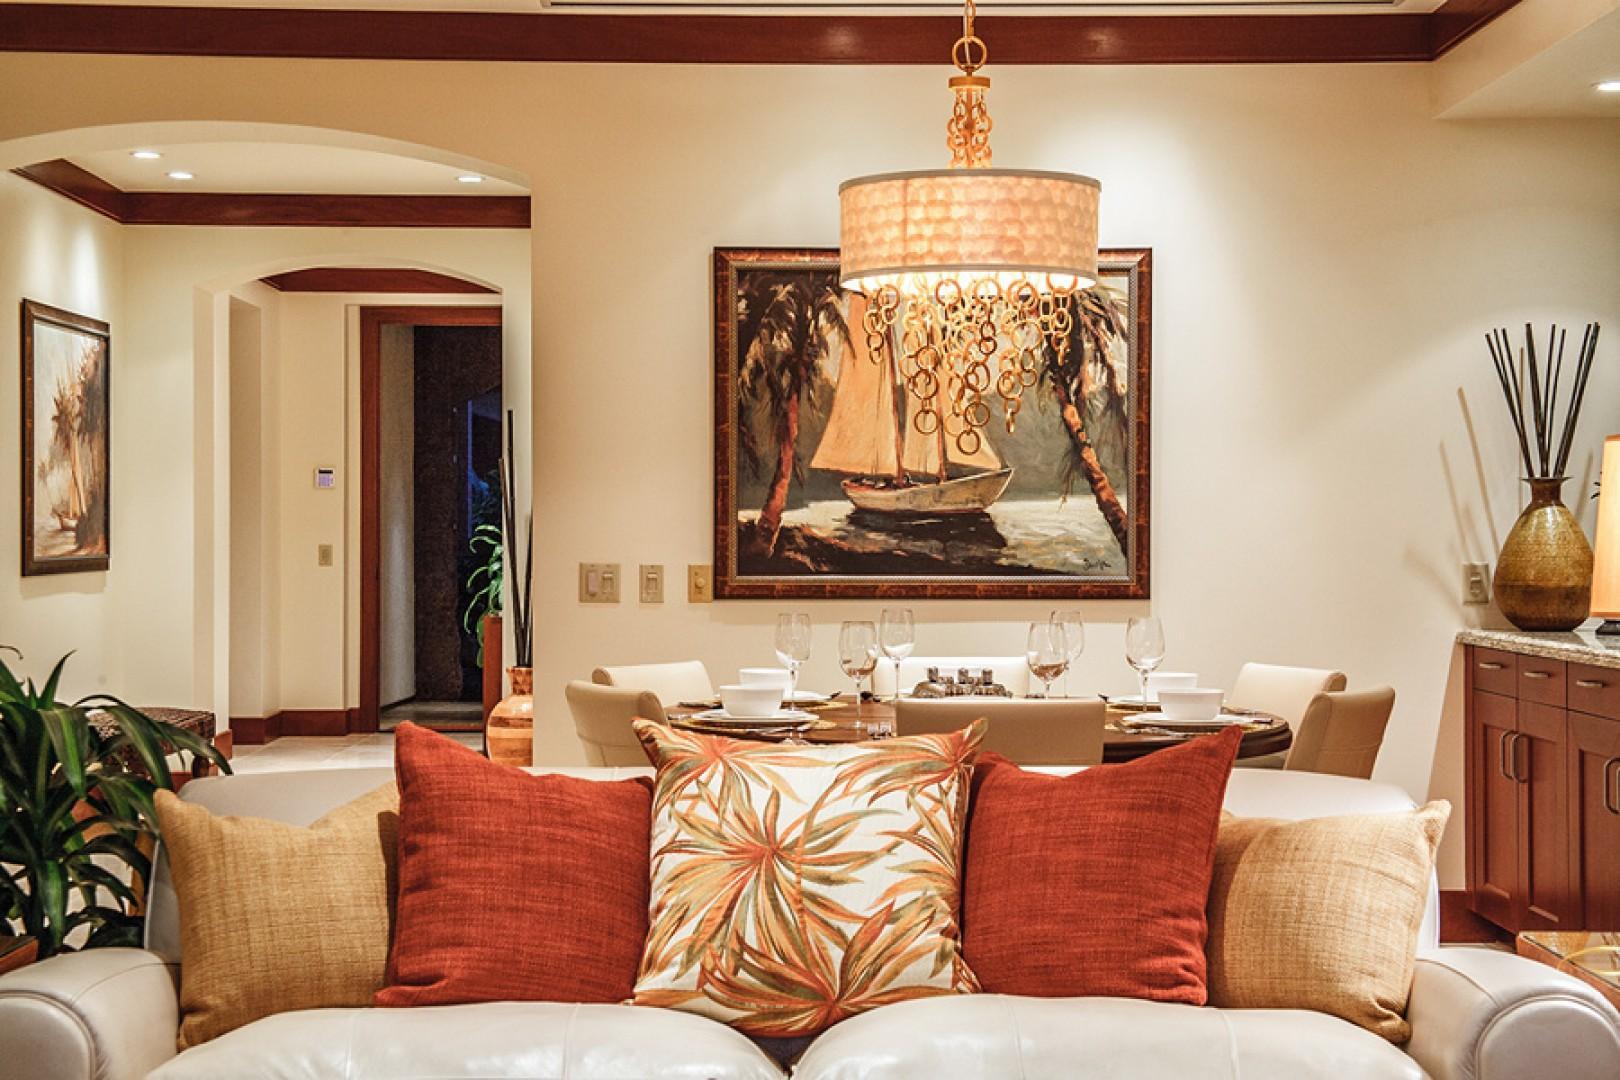 The finest art and decor throughout Bali Hai Pool Villa.